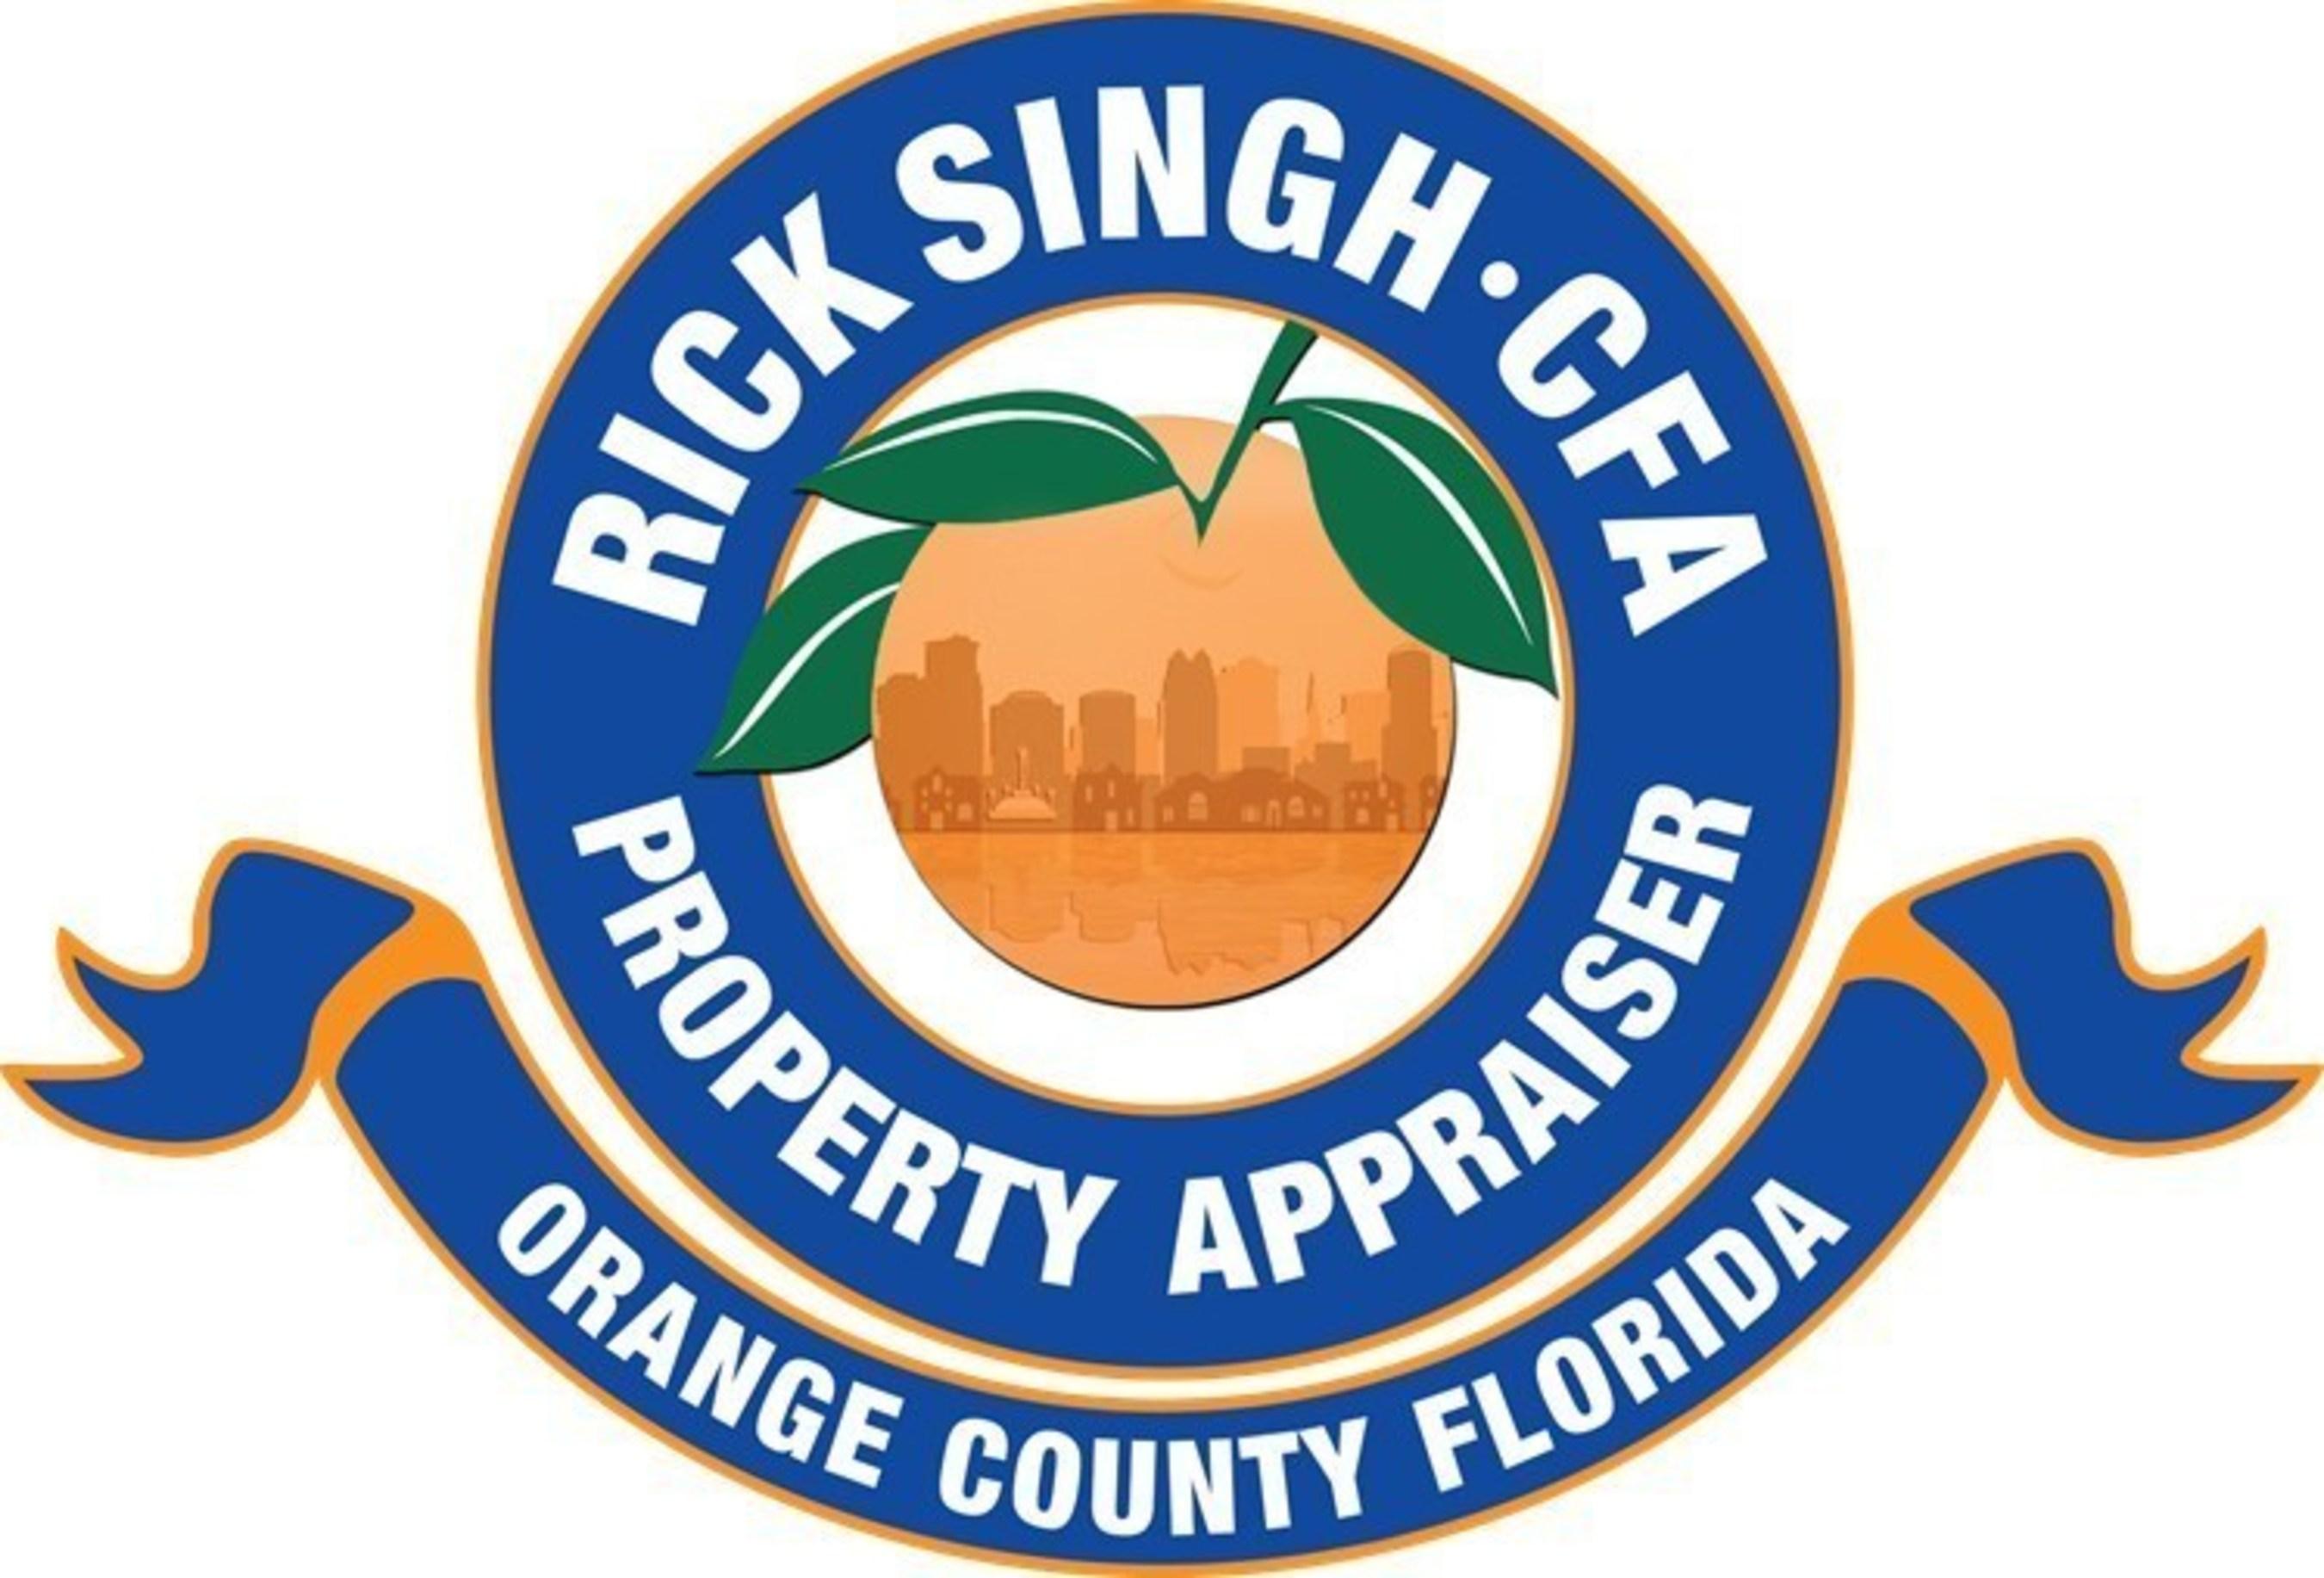 Rick Singh Disney